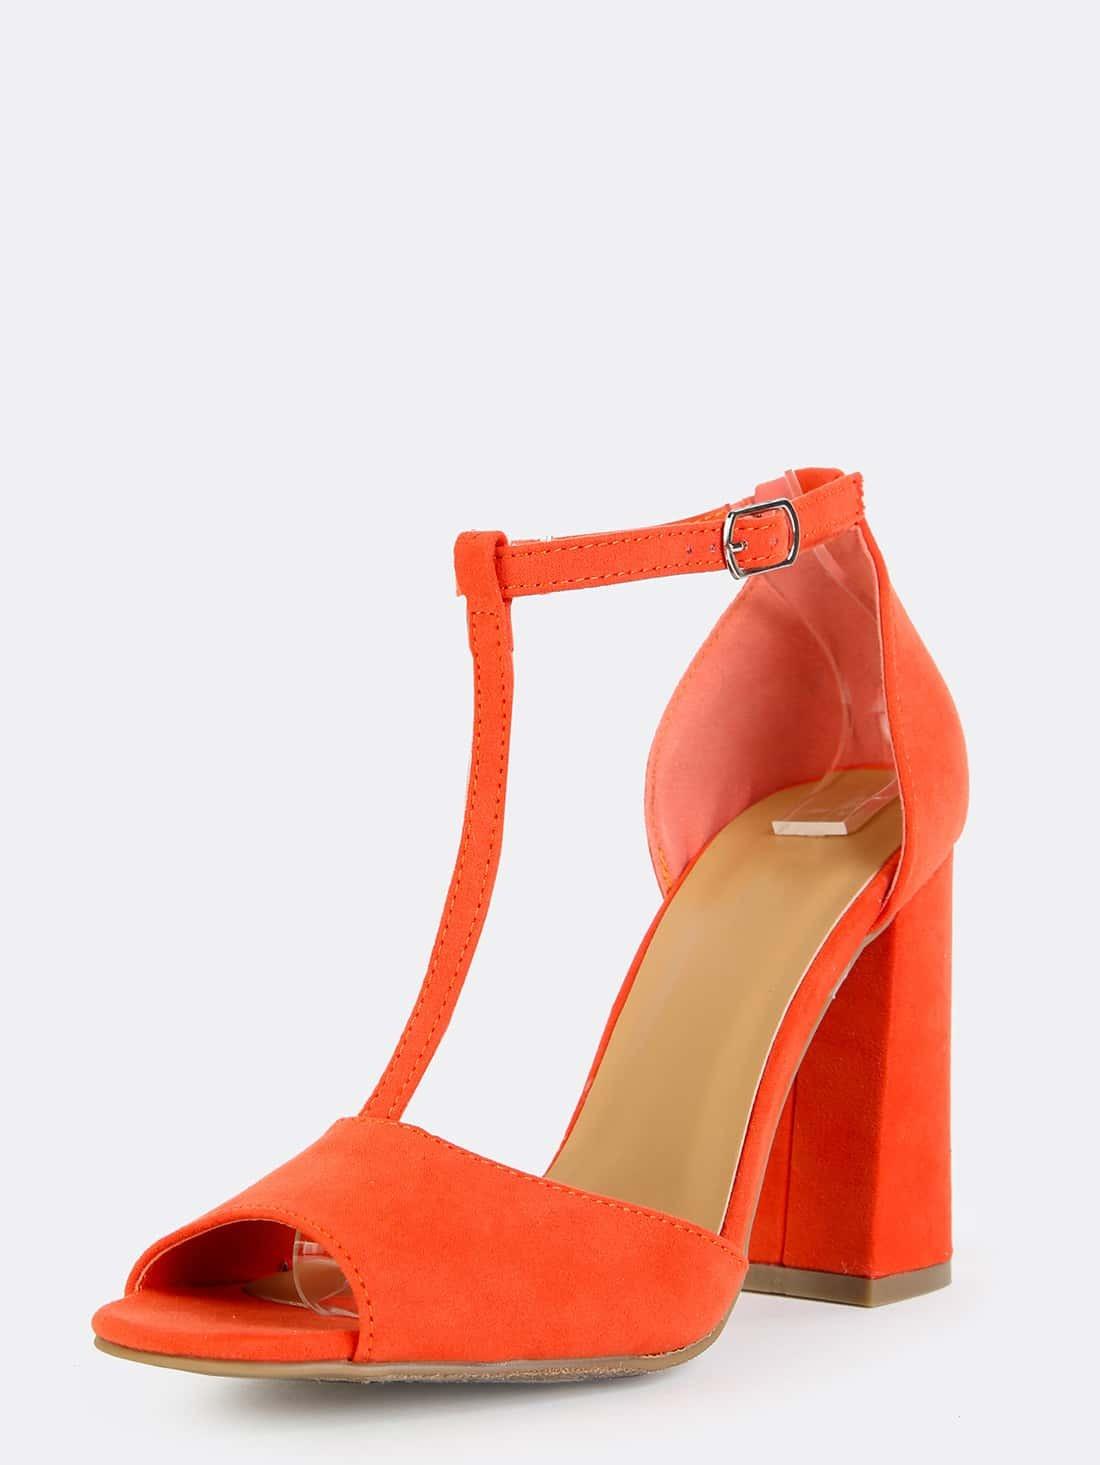 Retro Inspired T-Strap Chunky Heels ORANGE -SheIn(Sheinside)